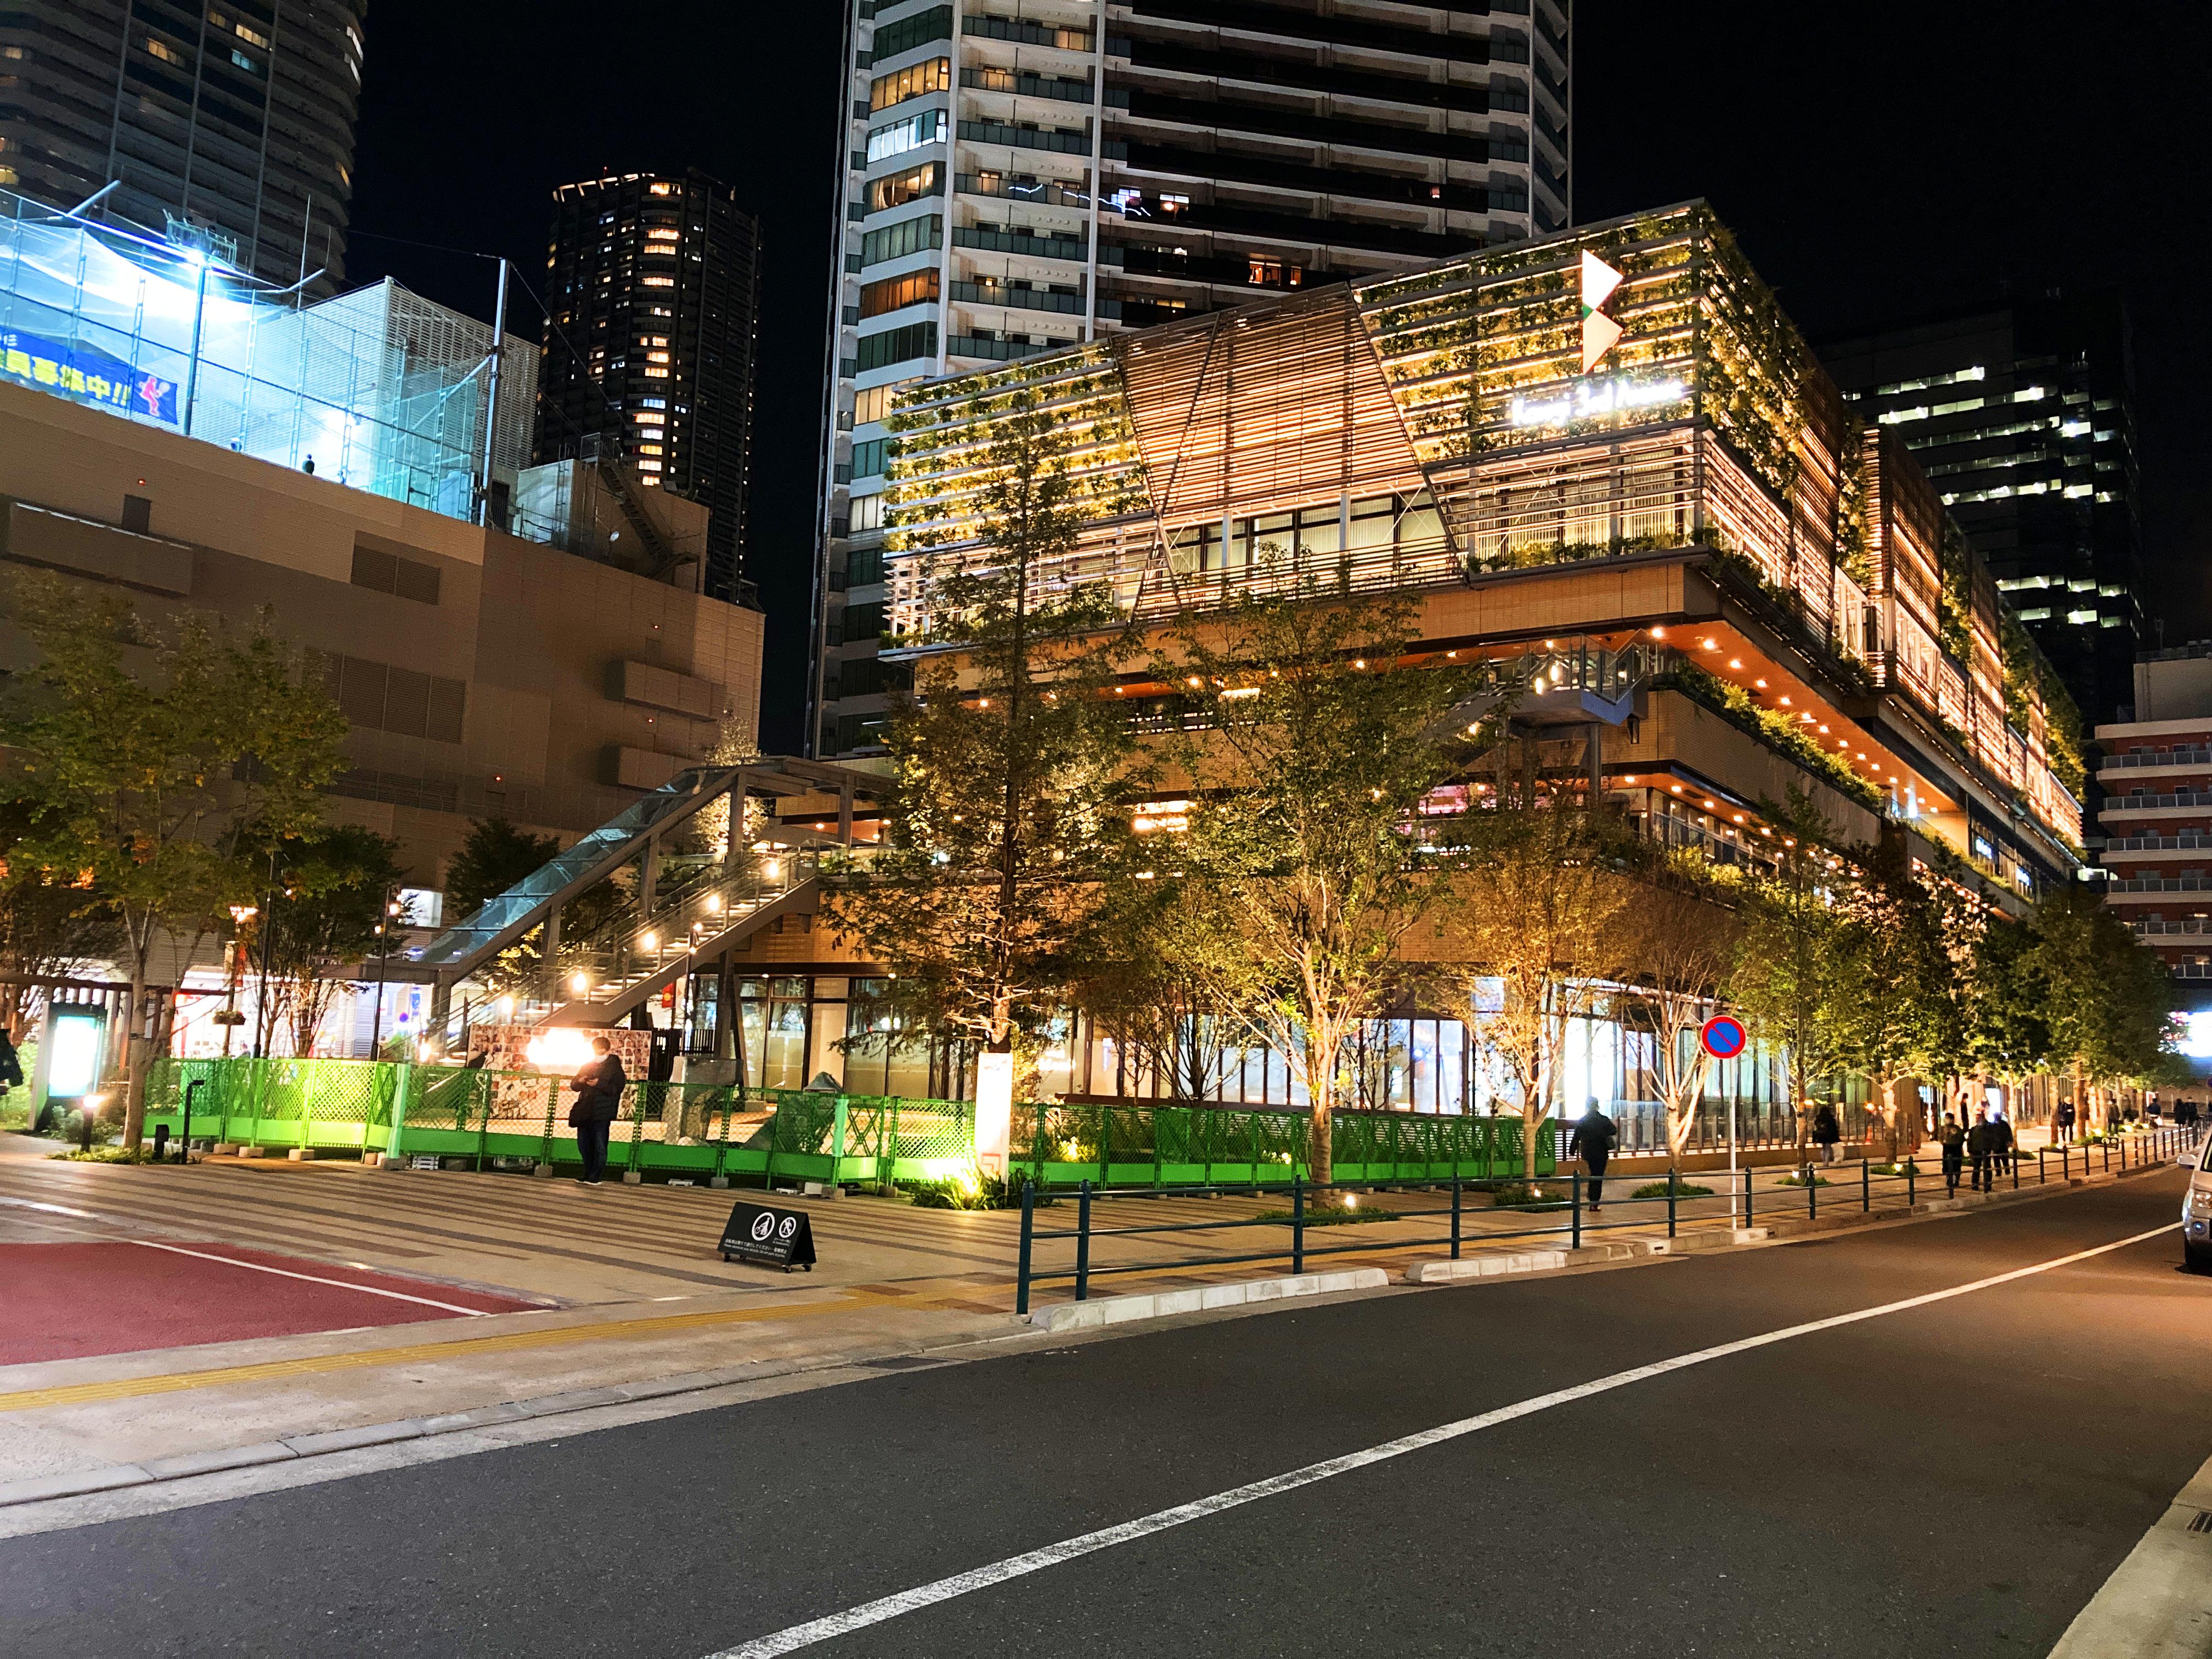 3rd Avenue Food Market 全店レポ【サードアヴェニュー武蔵小杉】